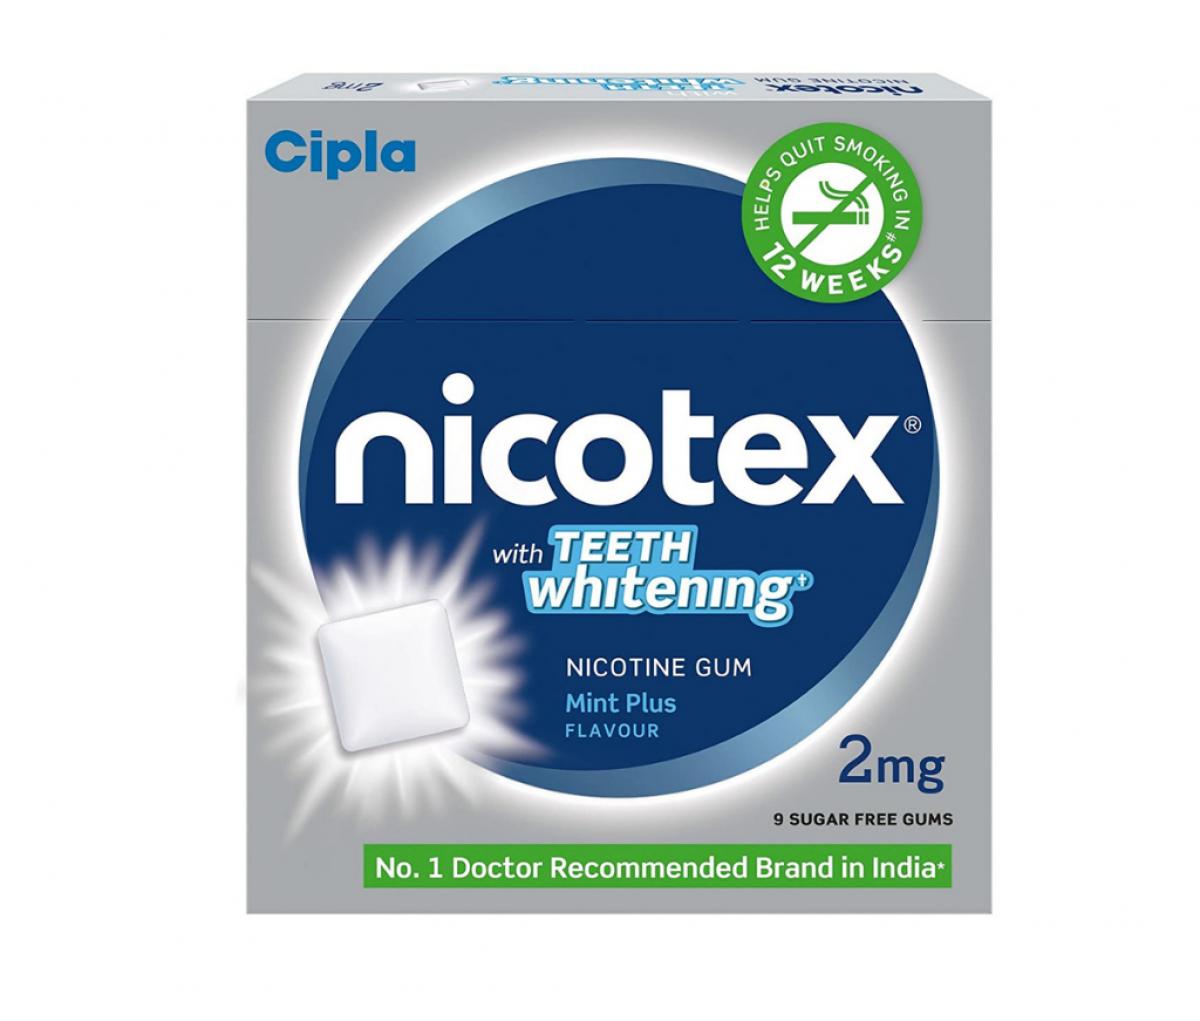 Nicotex Teeth Whitening 2mg Chewing Gums Mint Plus